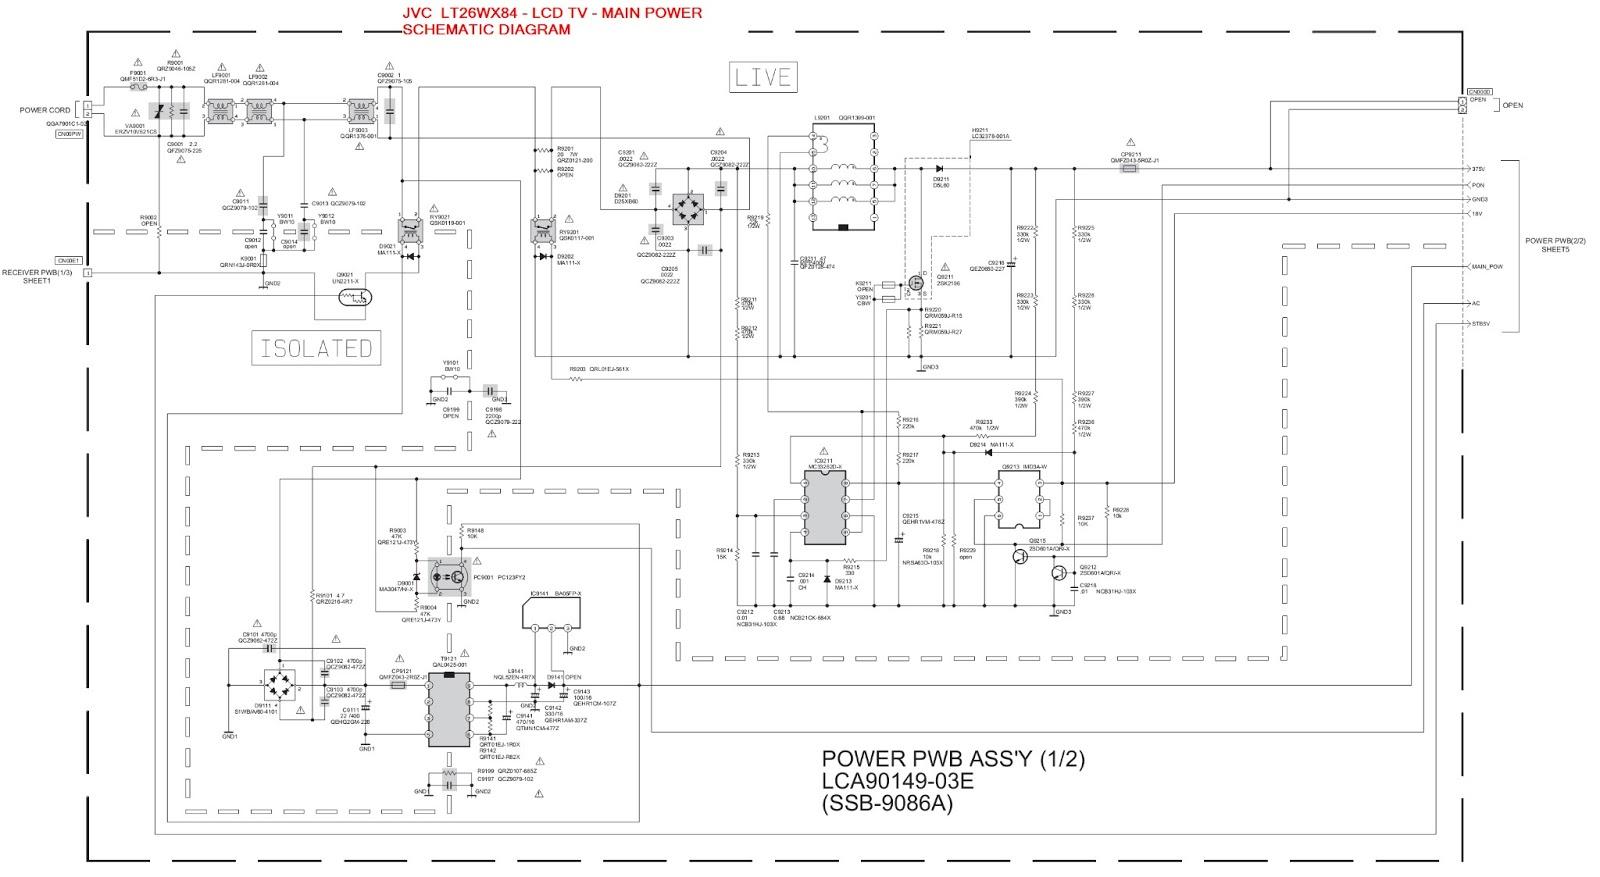 circuit diagram jvc tv wiring library circuit diagram jvc tv [ 1600 x 877 Pixel ]